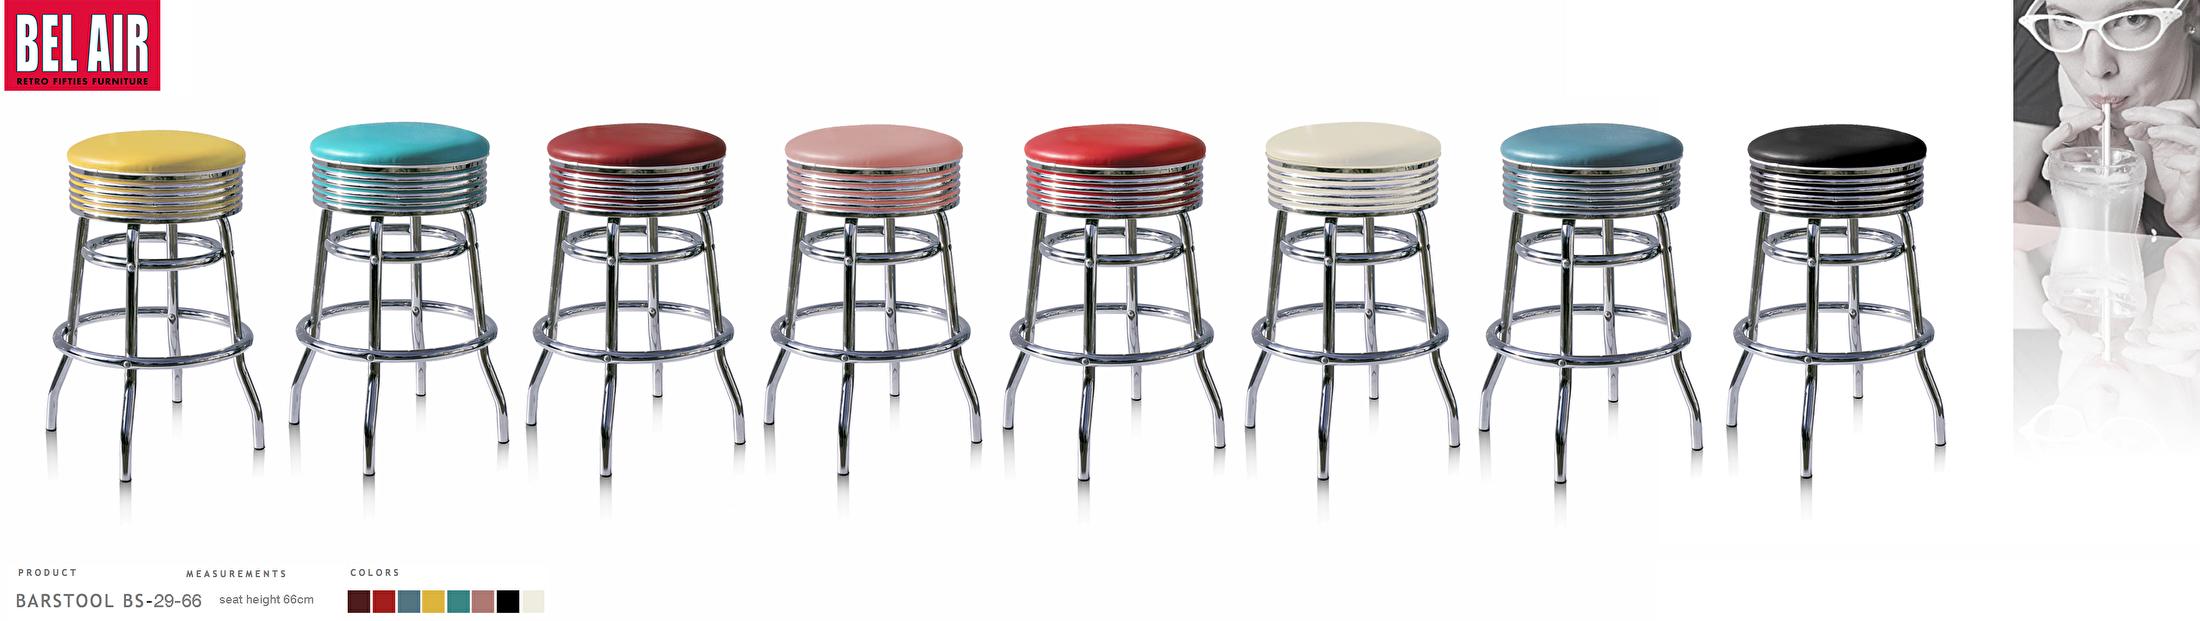 Fifties Design kruk 66cm hoog Bel Air Amerikaanse meubels